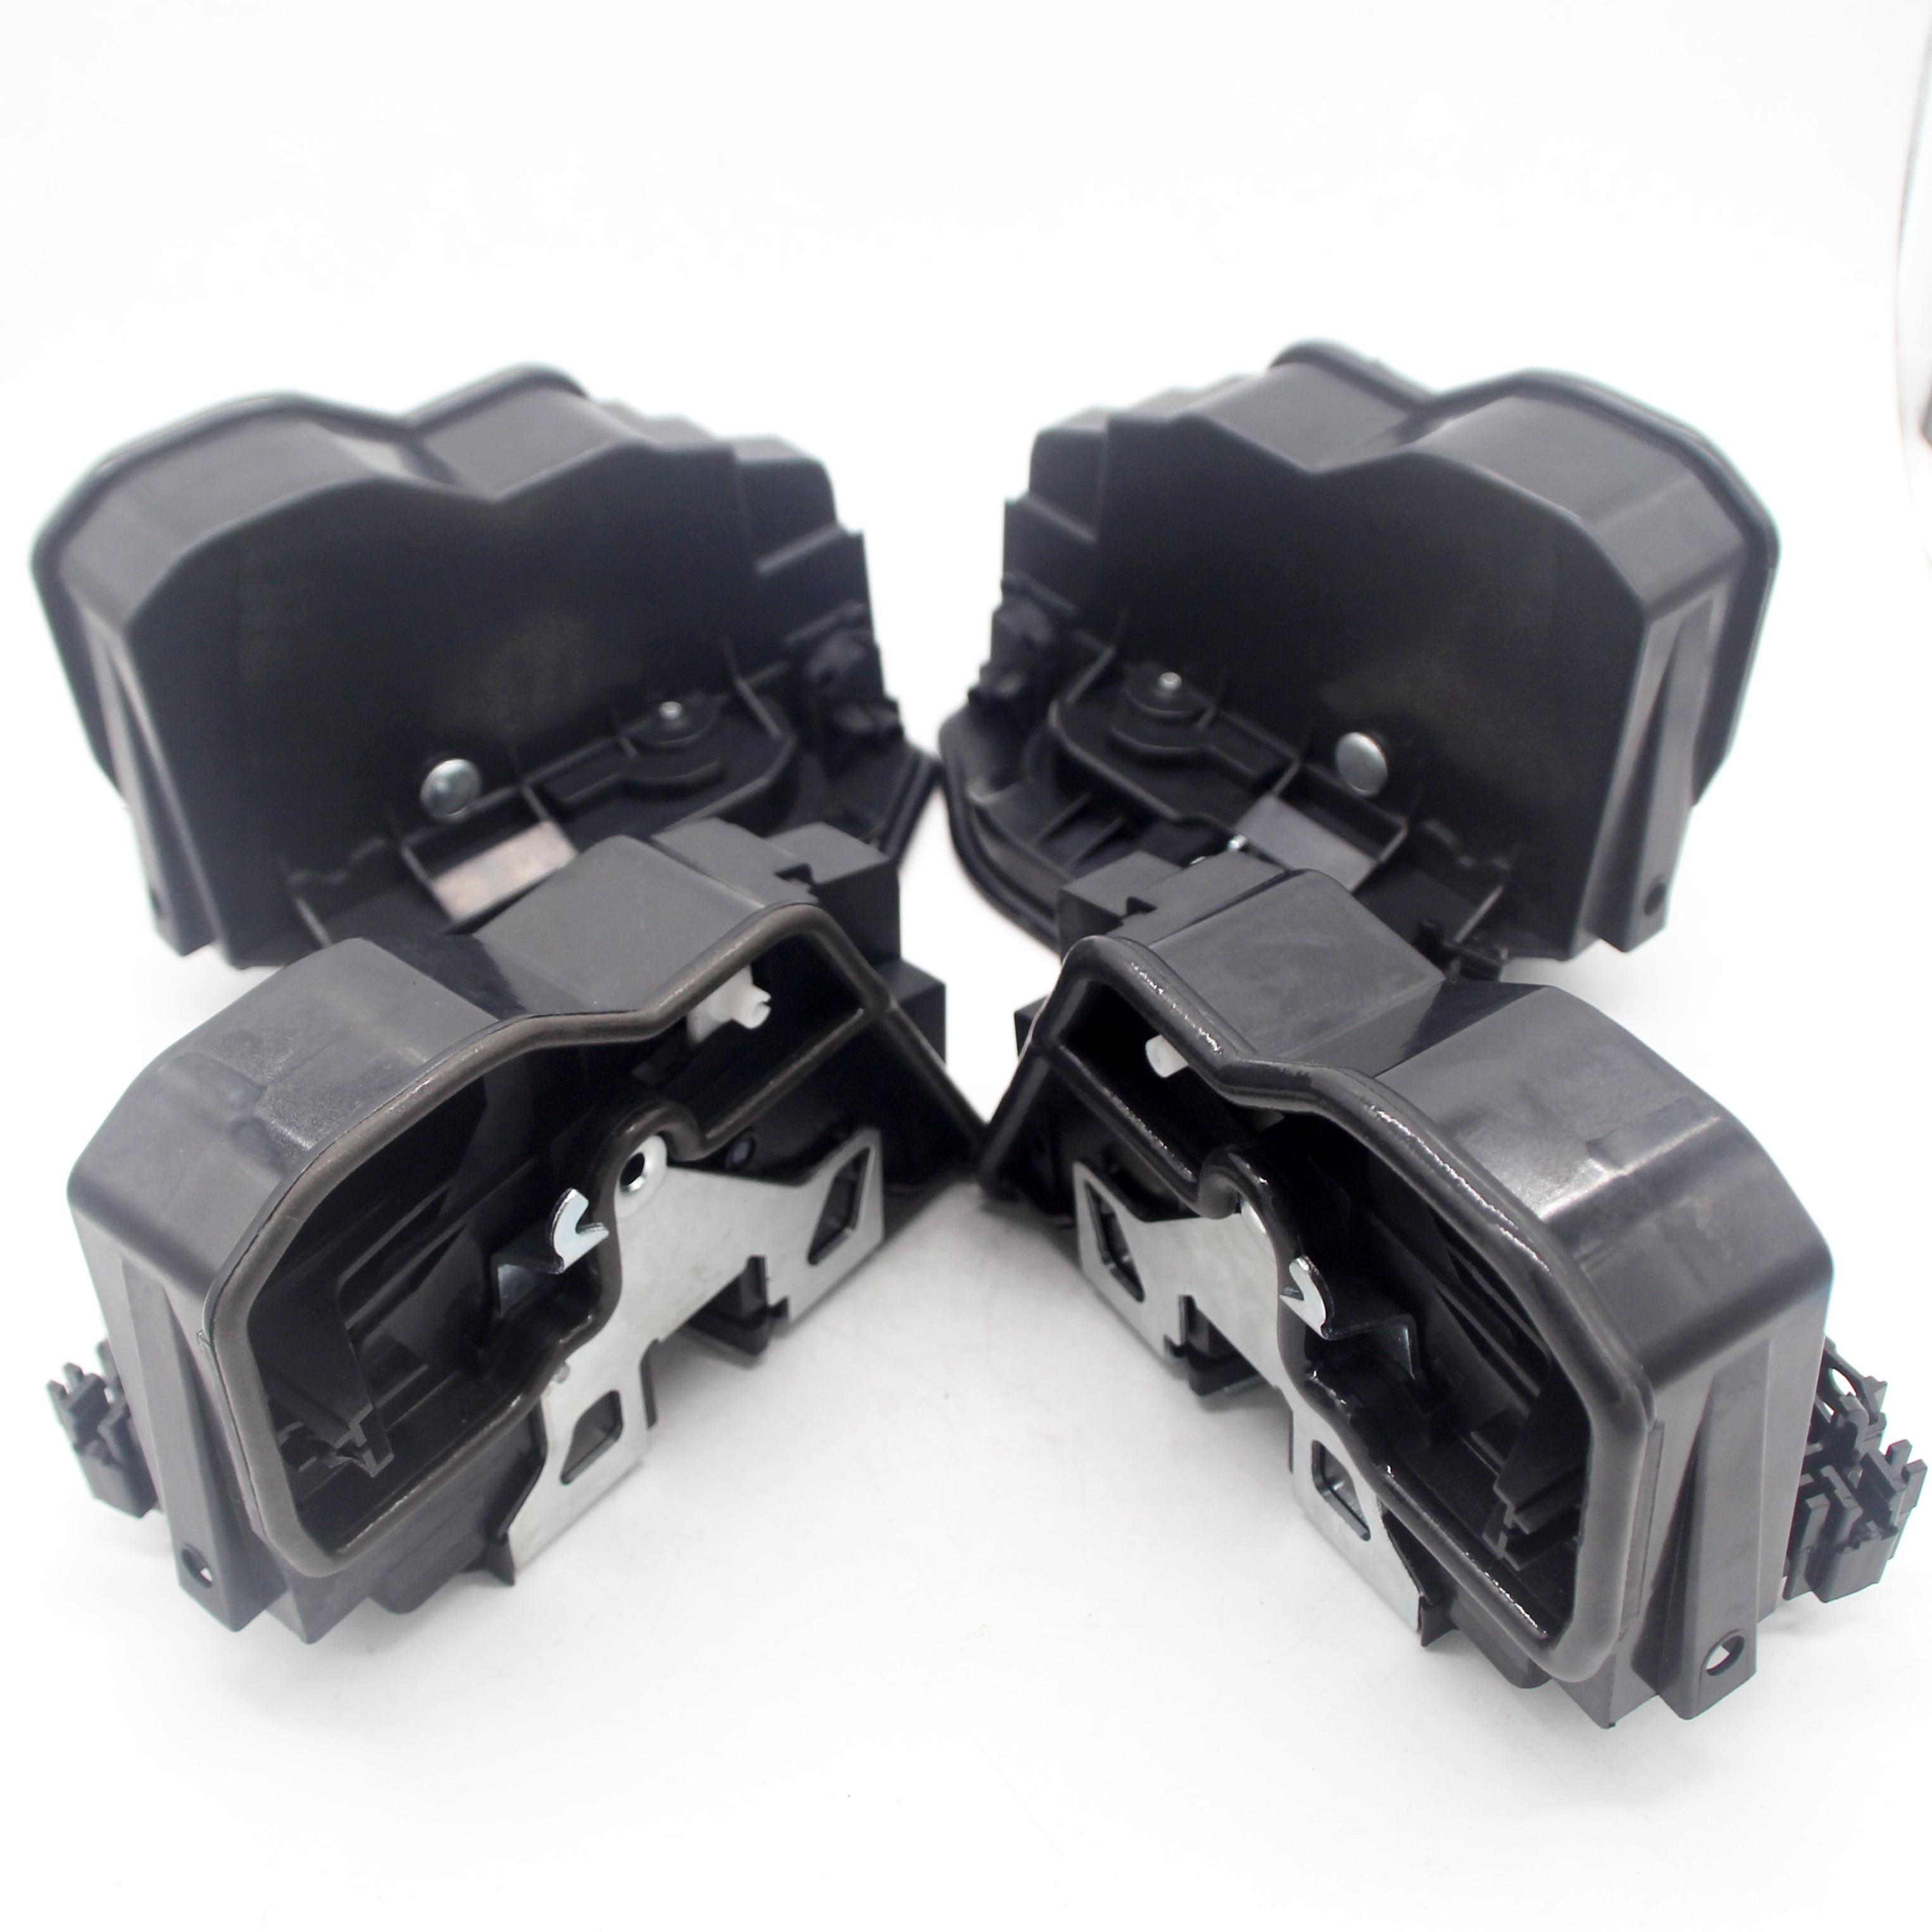 FRONT REAR LEFT RIGHT DOOR LATCH LOCK ACTUATOR For BMW X6 E60 E70 E90 MINI Cooper Vehicles